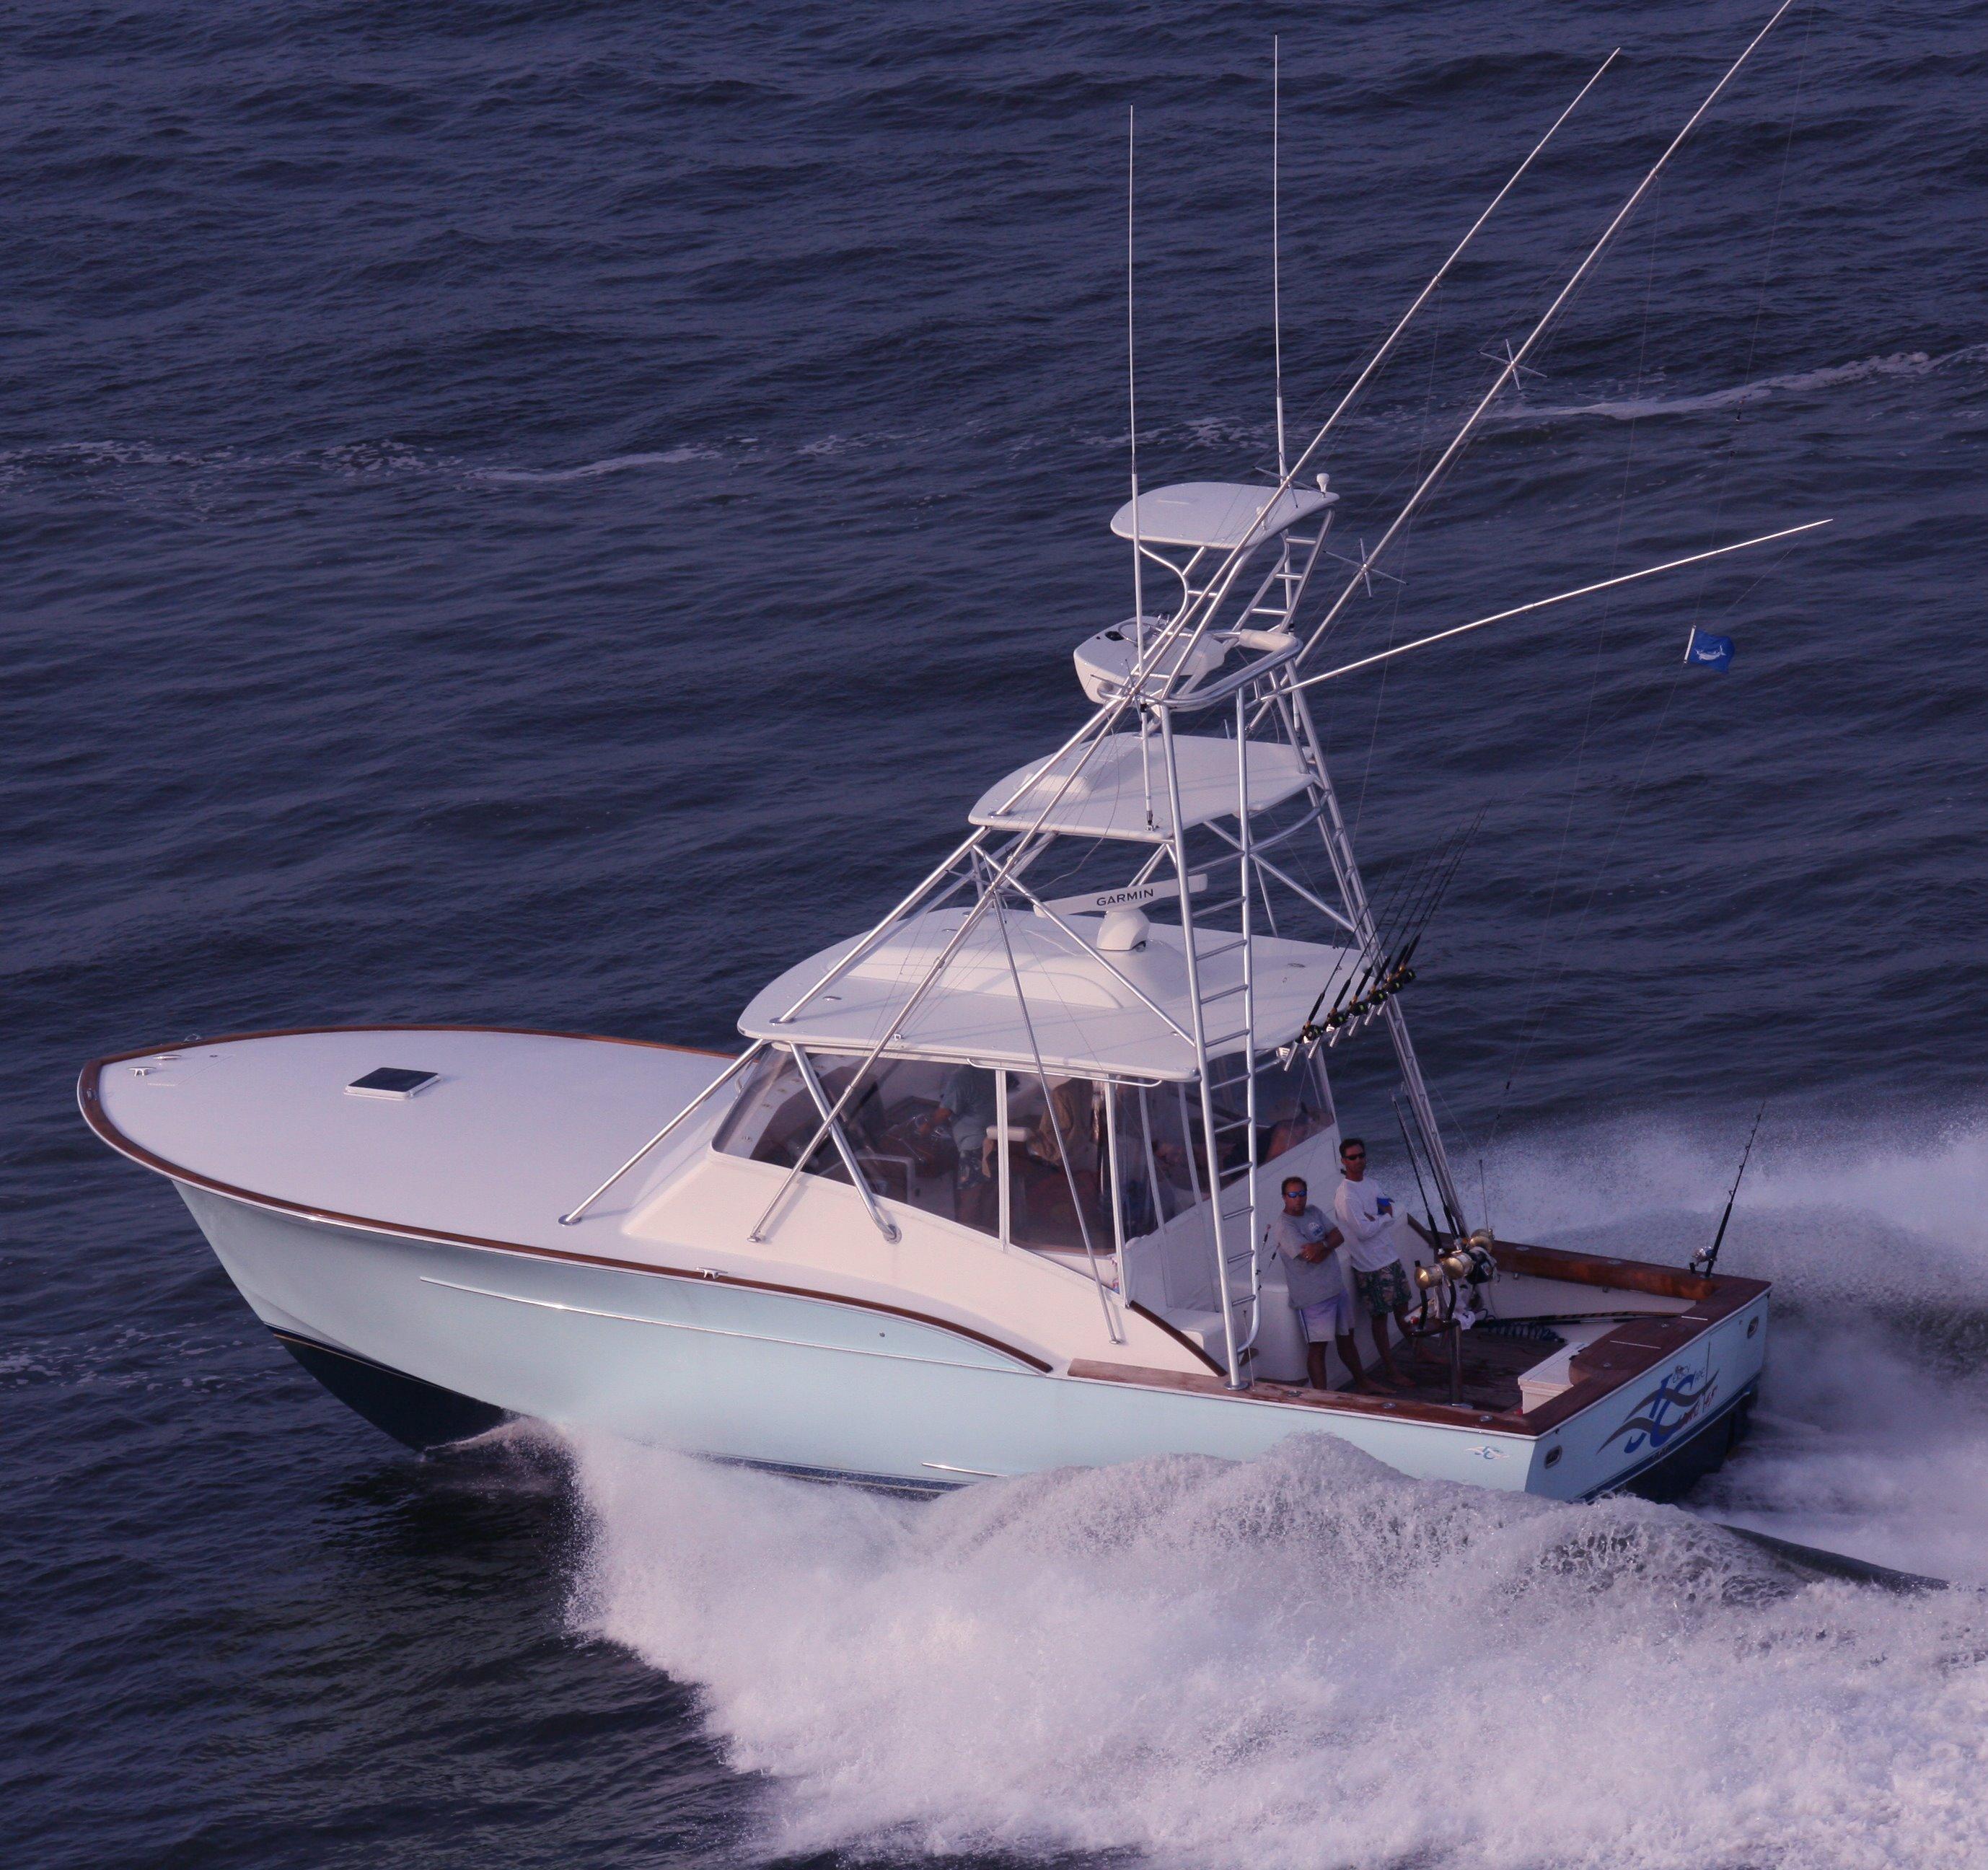 Boat Sales Cape Cod: 2018 Jersey Cape Devil 45- Express Power Boat For Sale